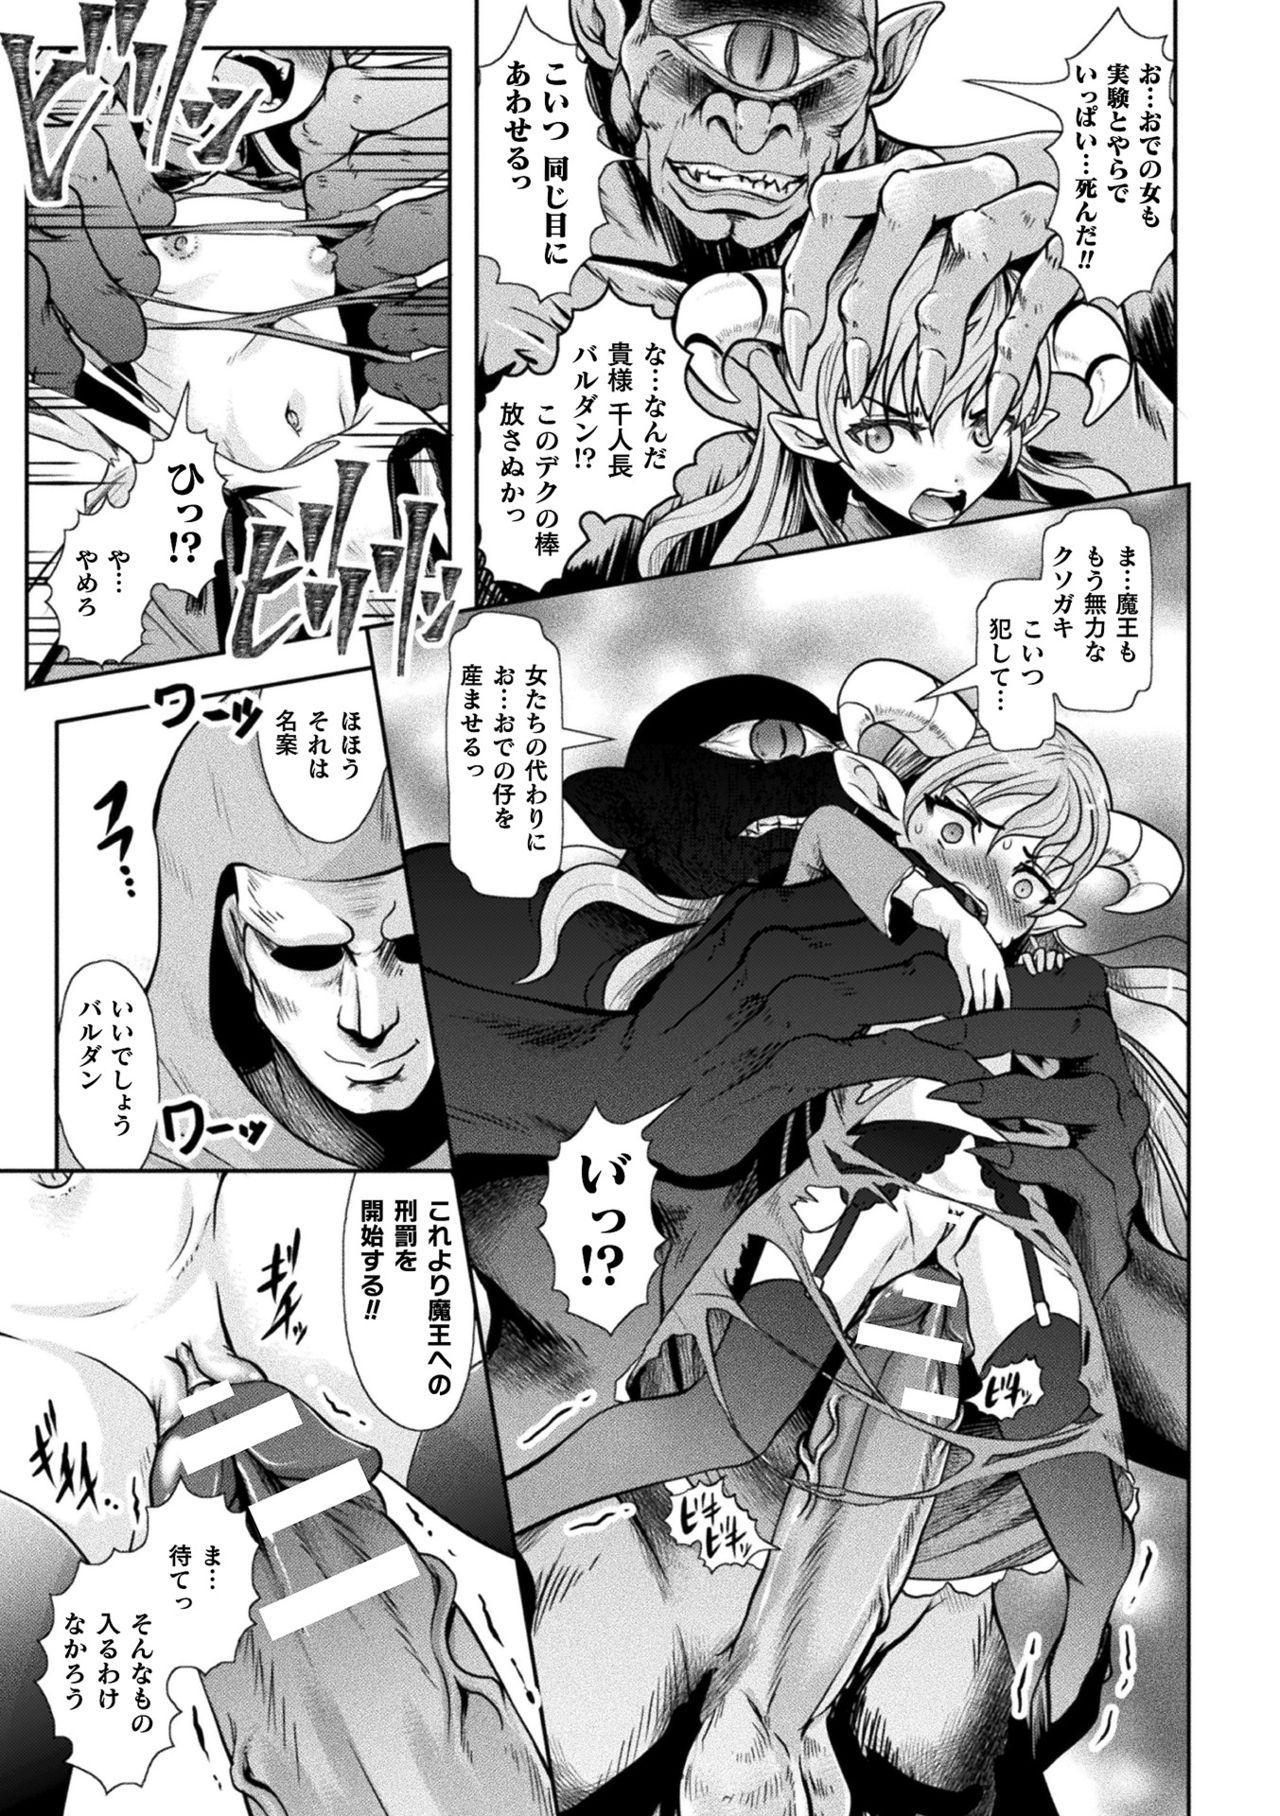 Loli-babaa Kyousei Tanetsuke Ecchi! Vol. 2 48